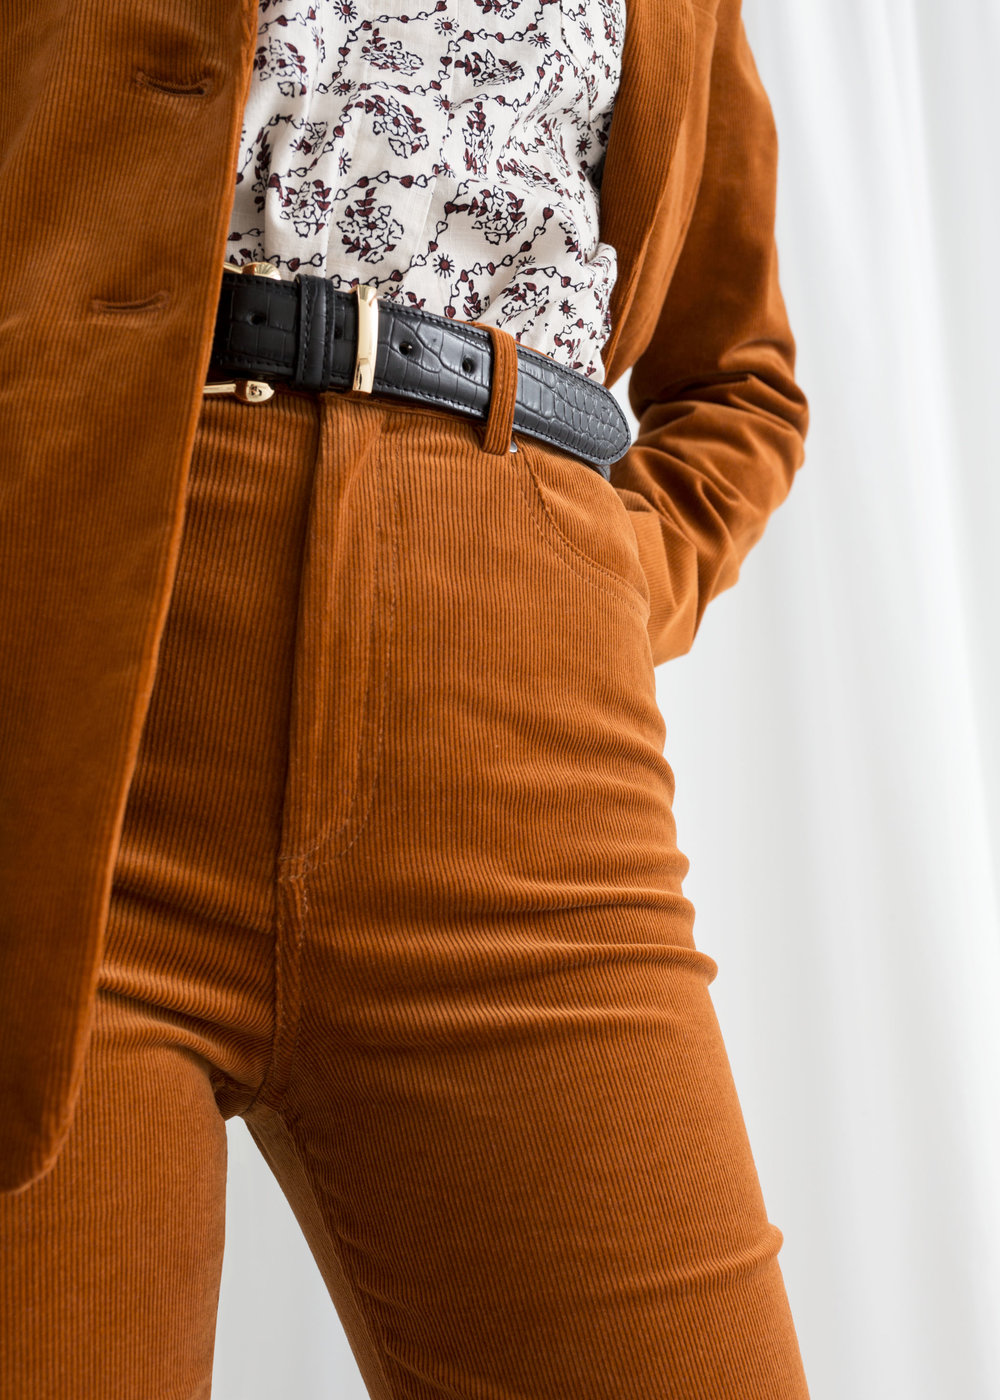 Orangea byxor , & Other Stories